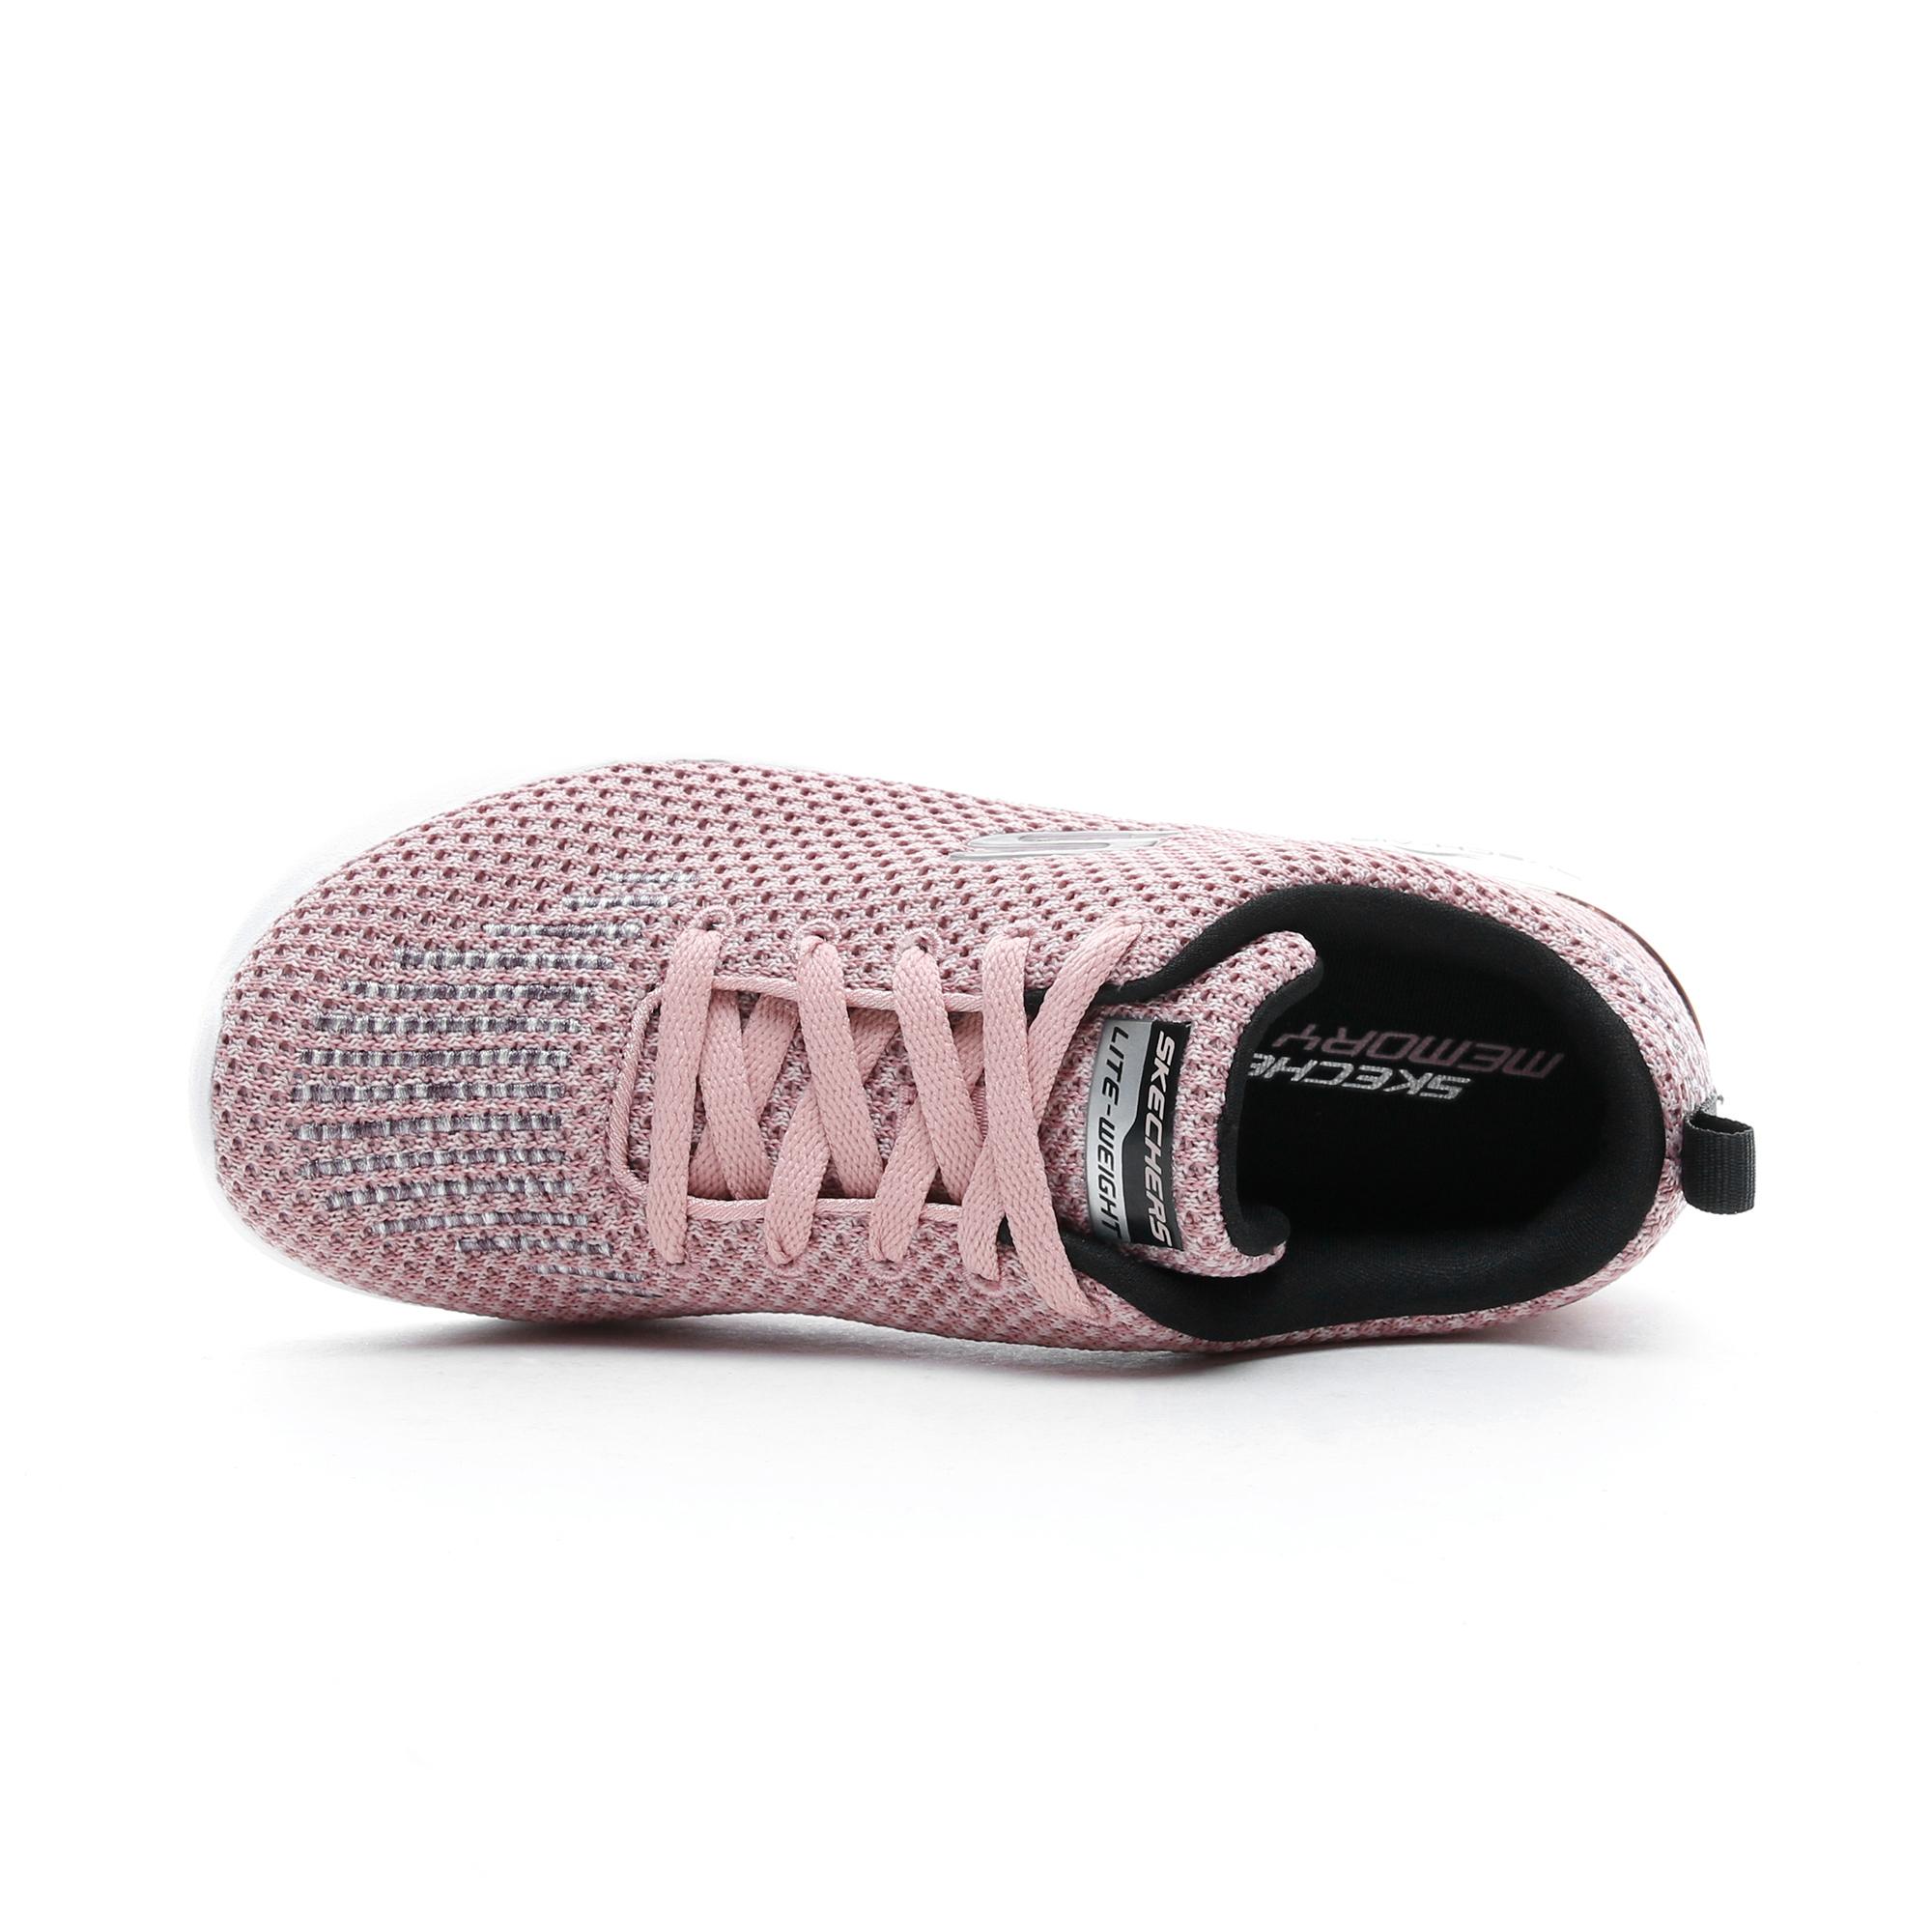 Skechers Skech-Air Dynamight Pembe Kadın Spor Ayakkabı